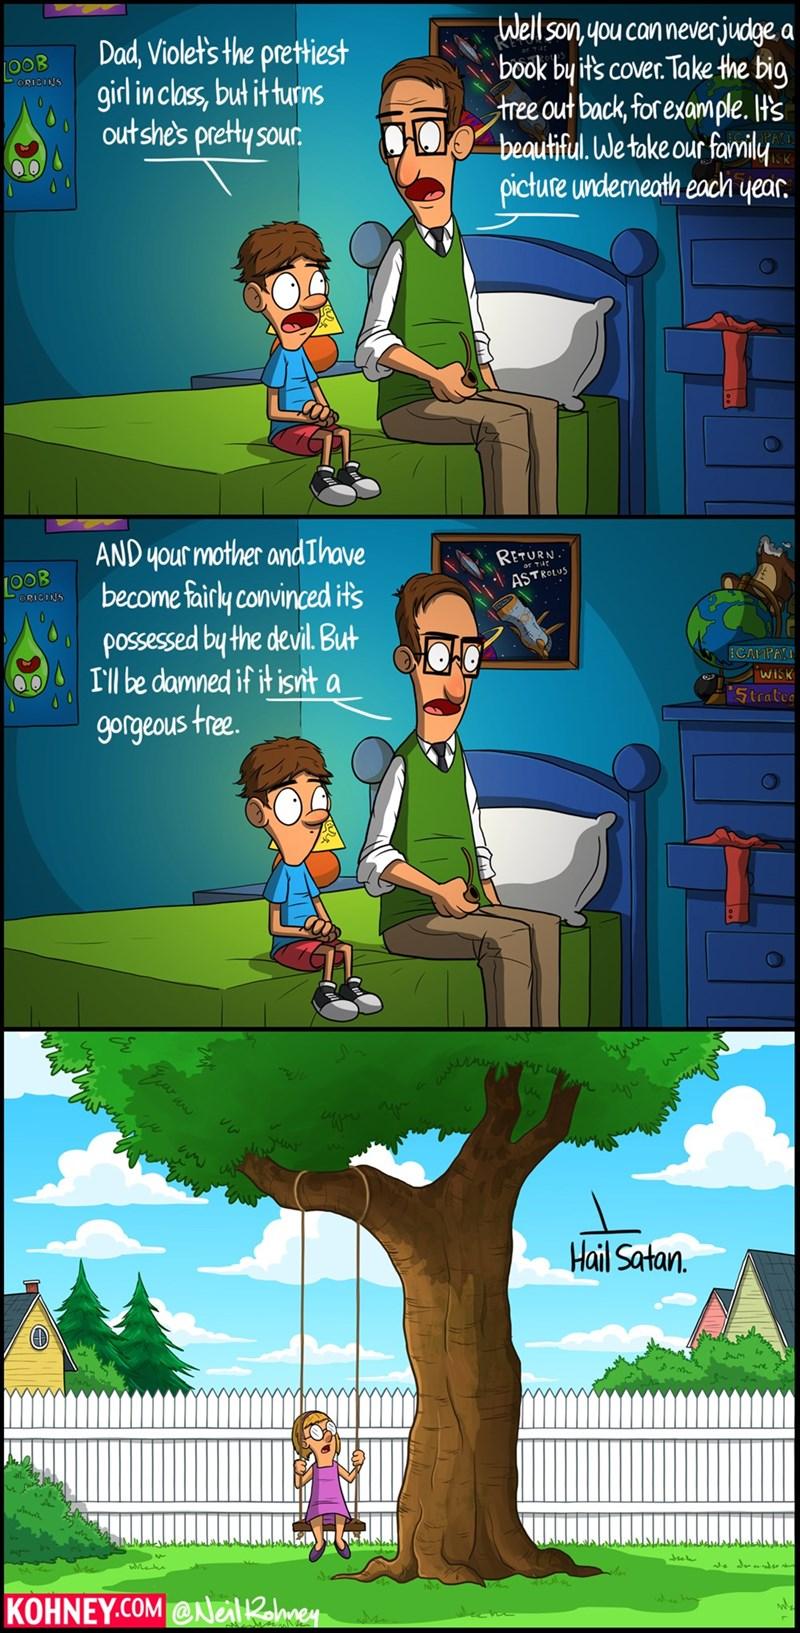 trees satan friendships web comics - 8582619904